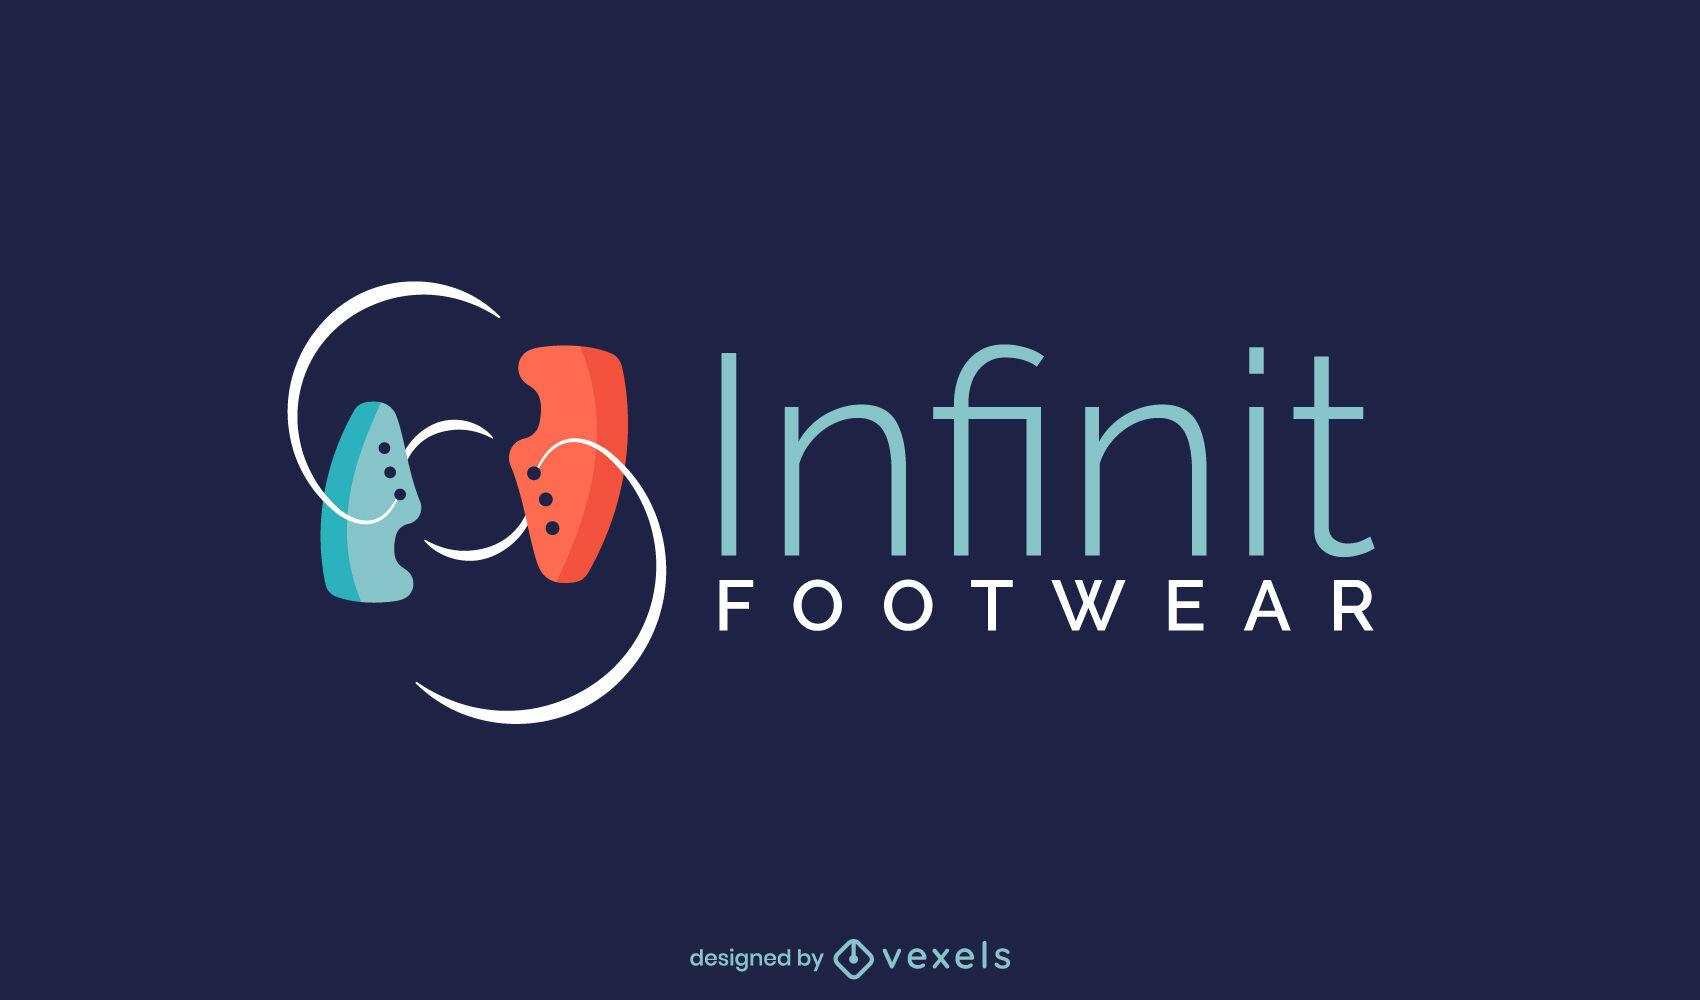 Shoes company logo template